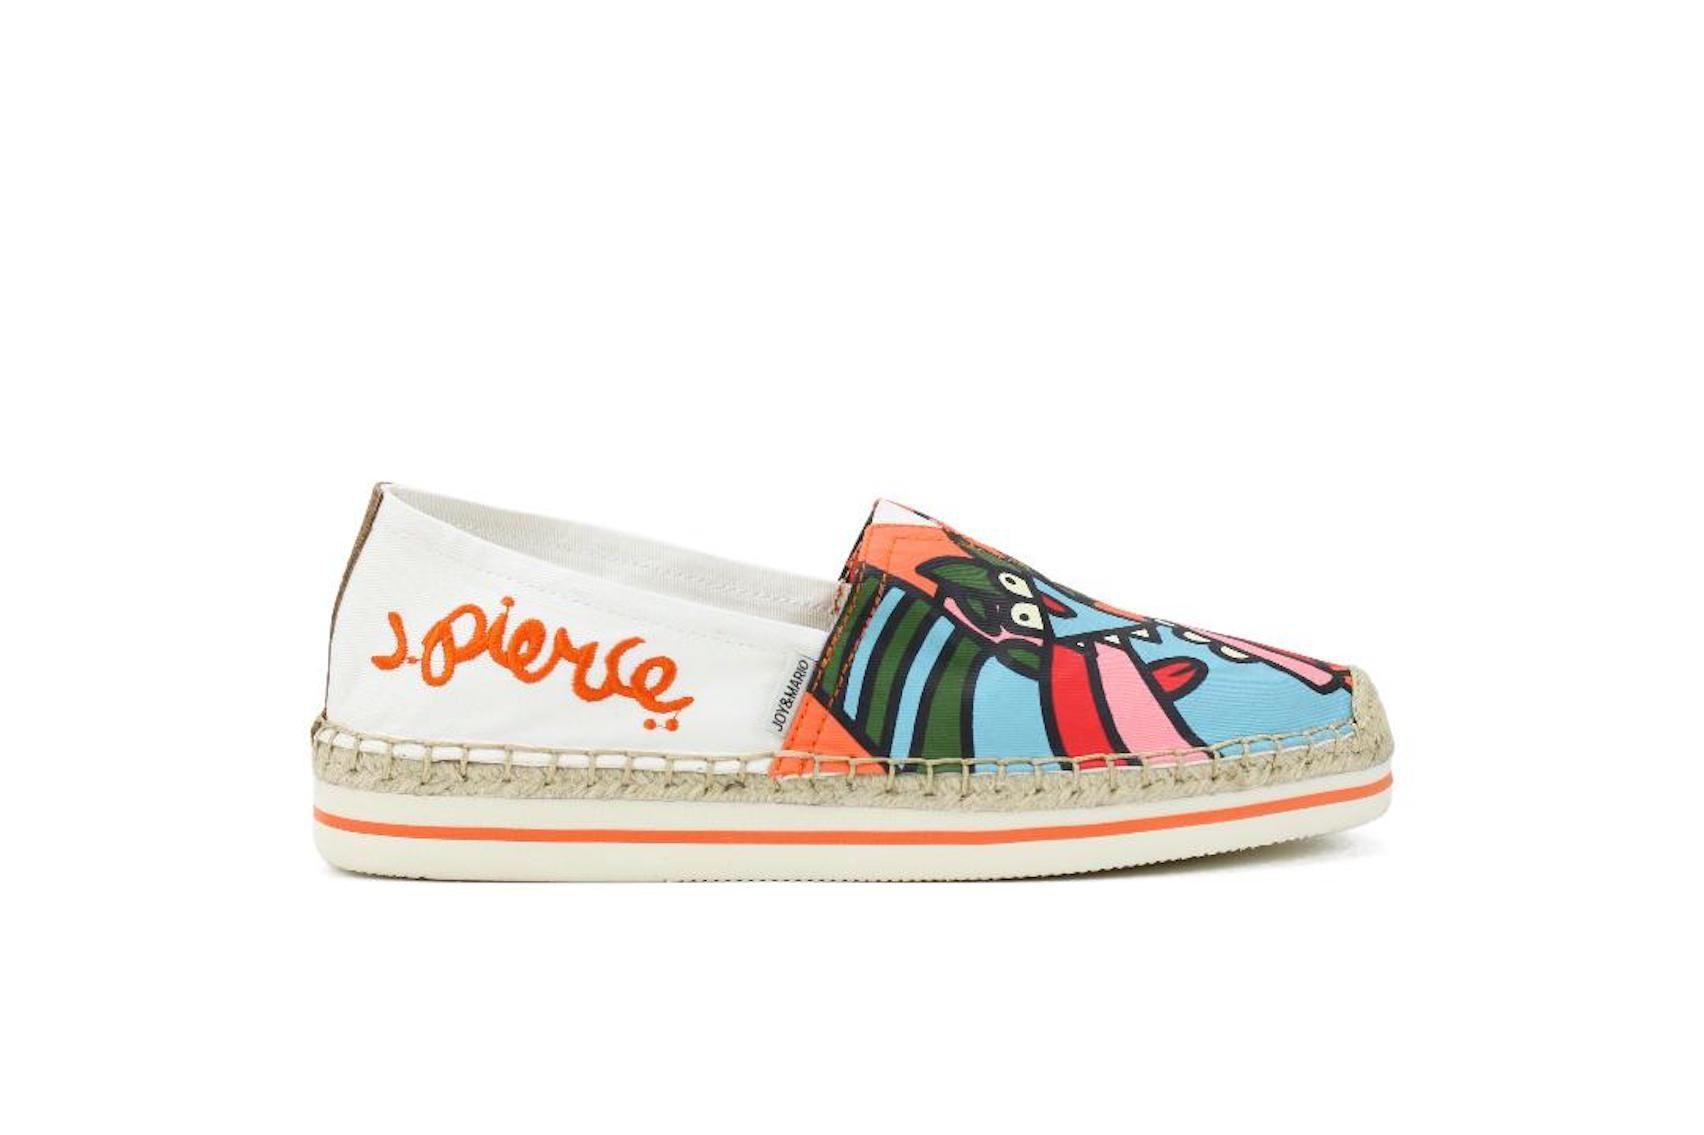 df324f467e Joy   Mario Women s Shoes - Oceanside - Orange